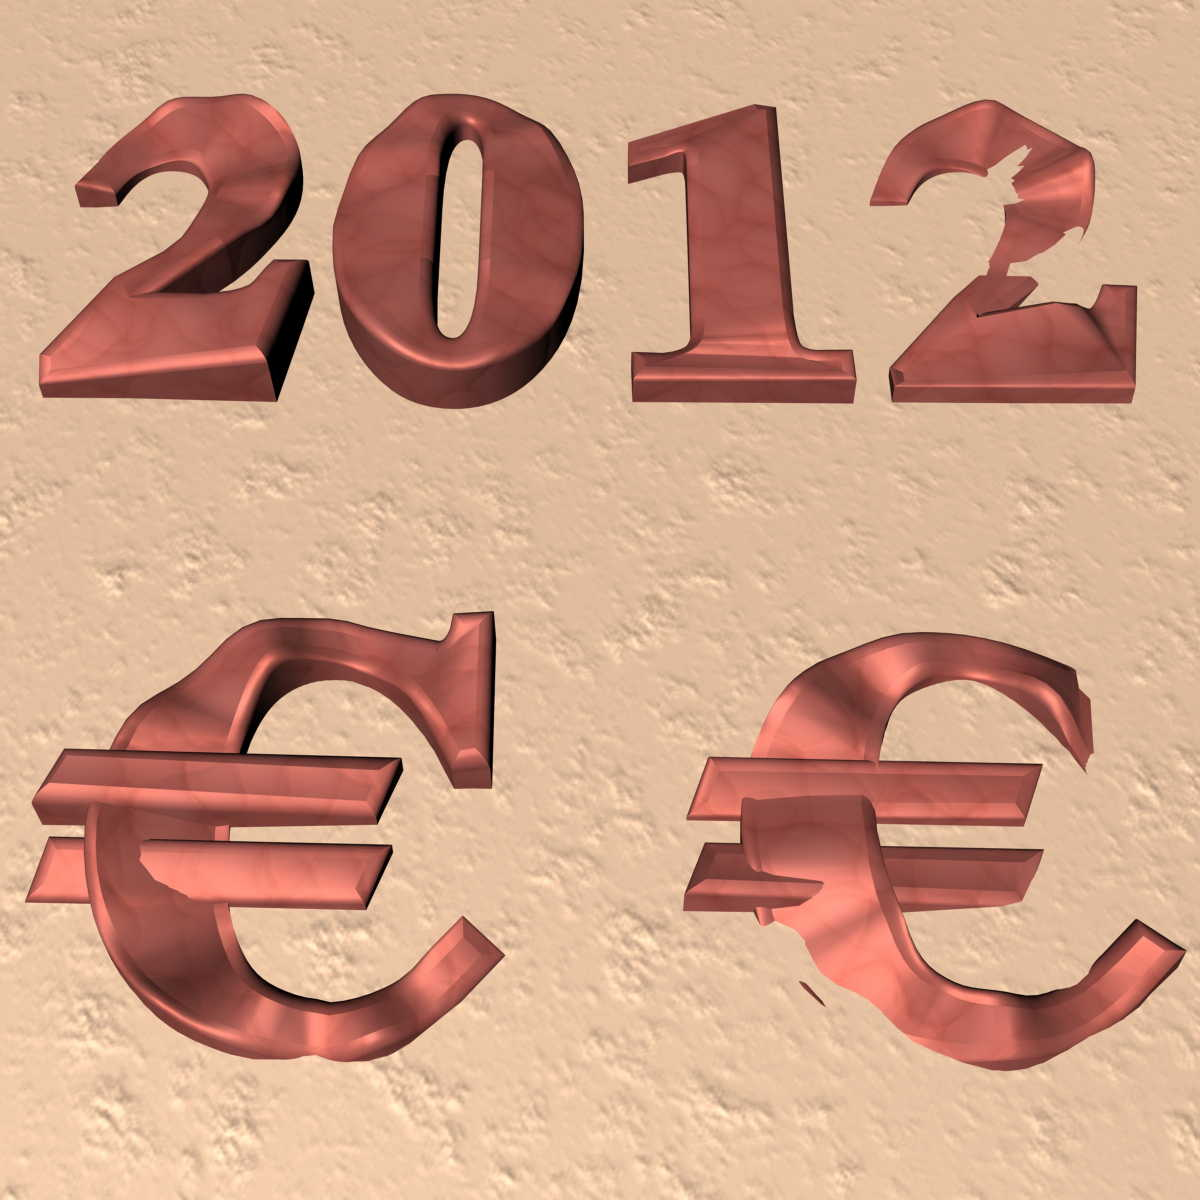 2012 der sterbende Euro